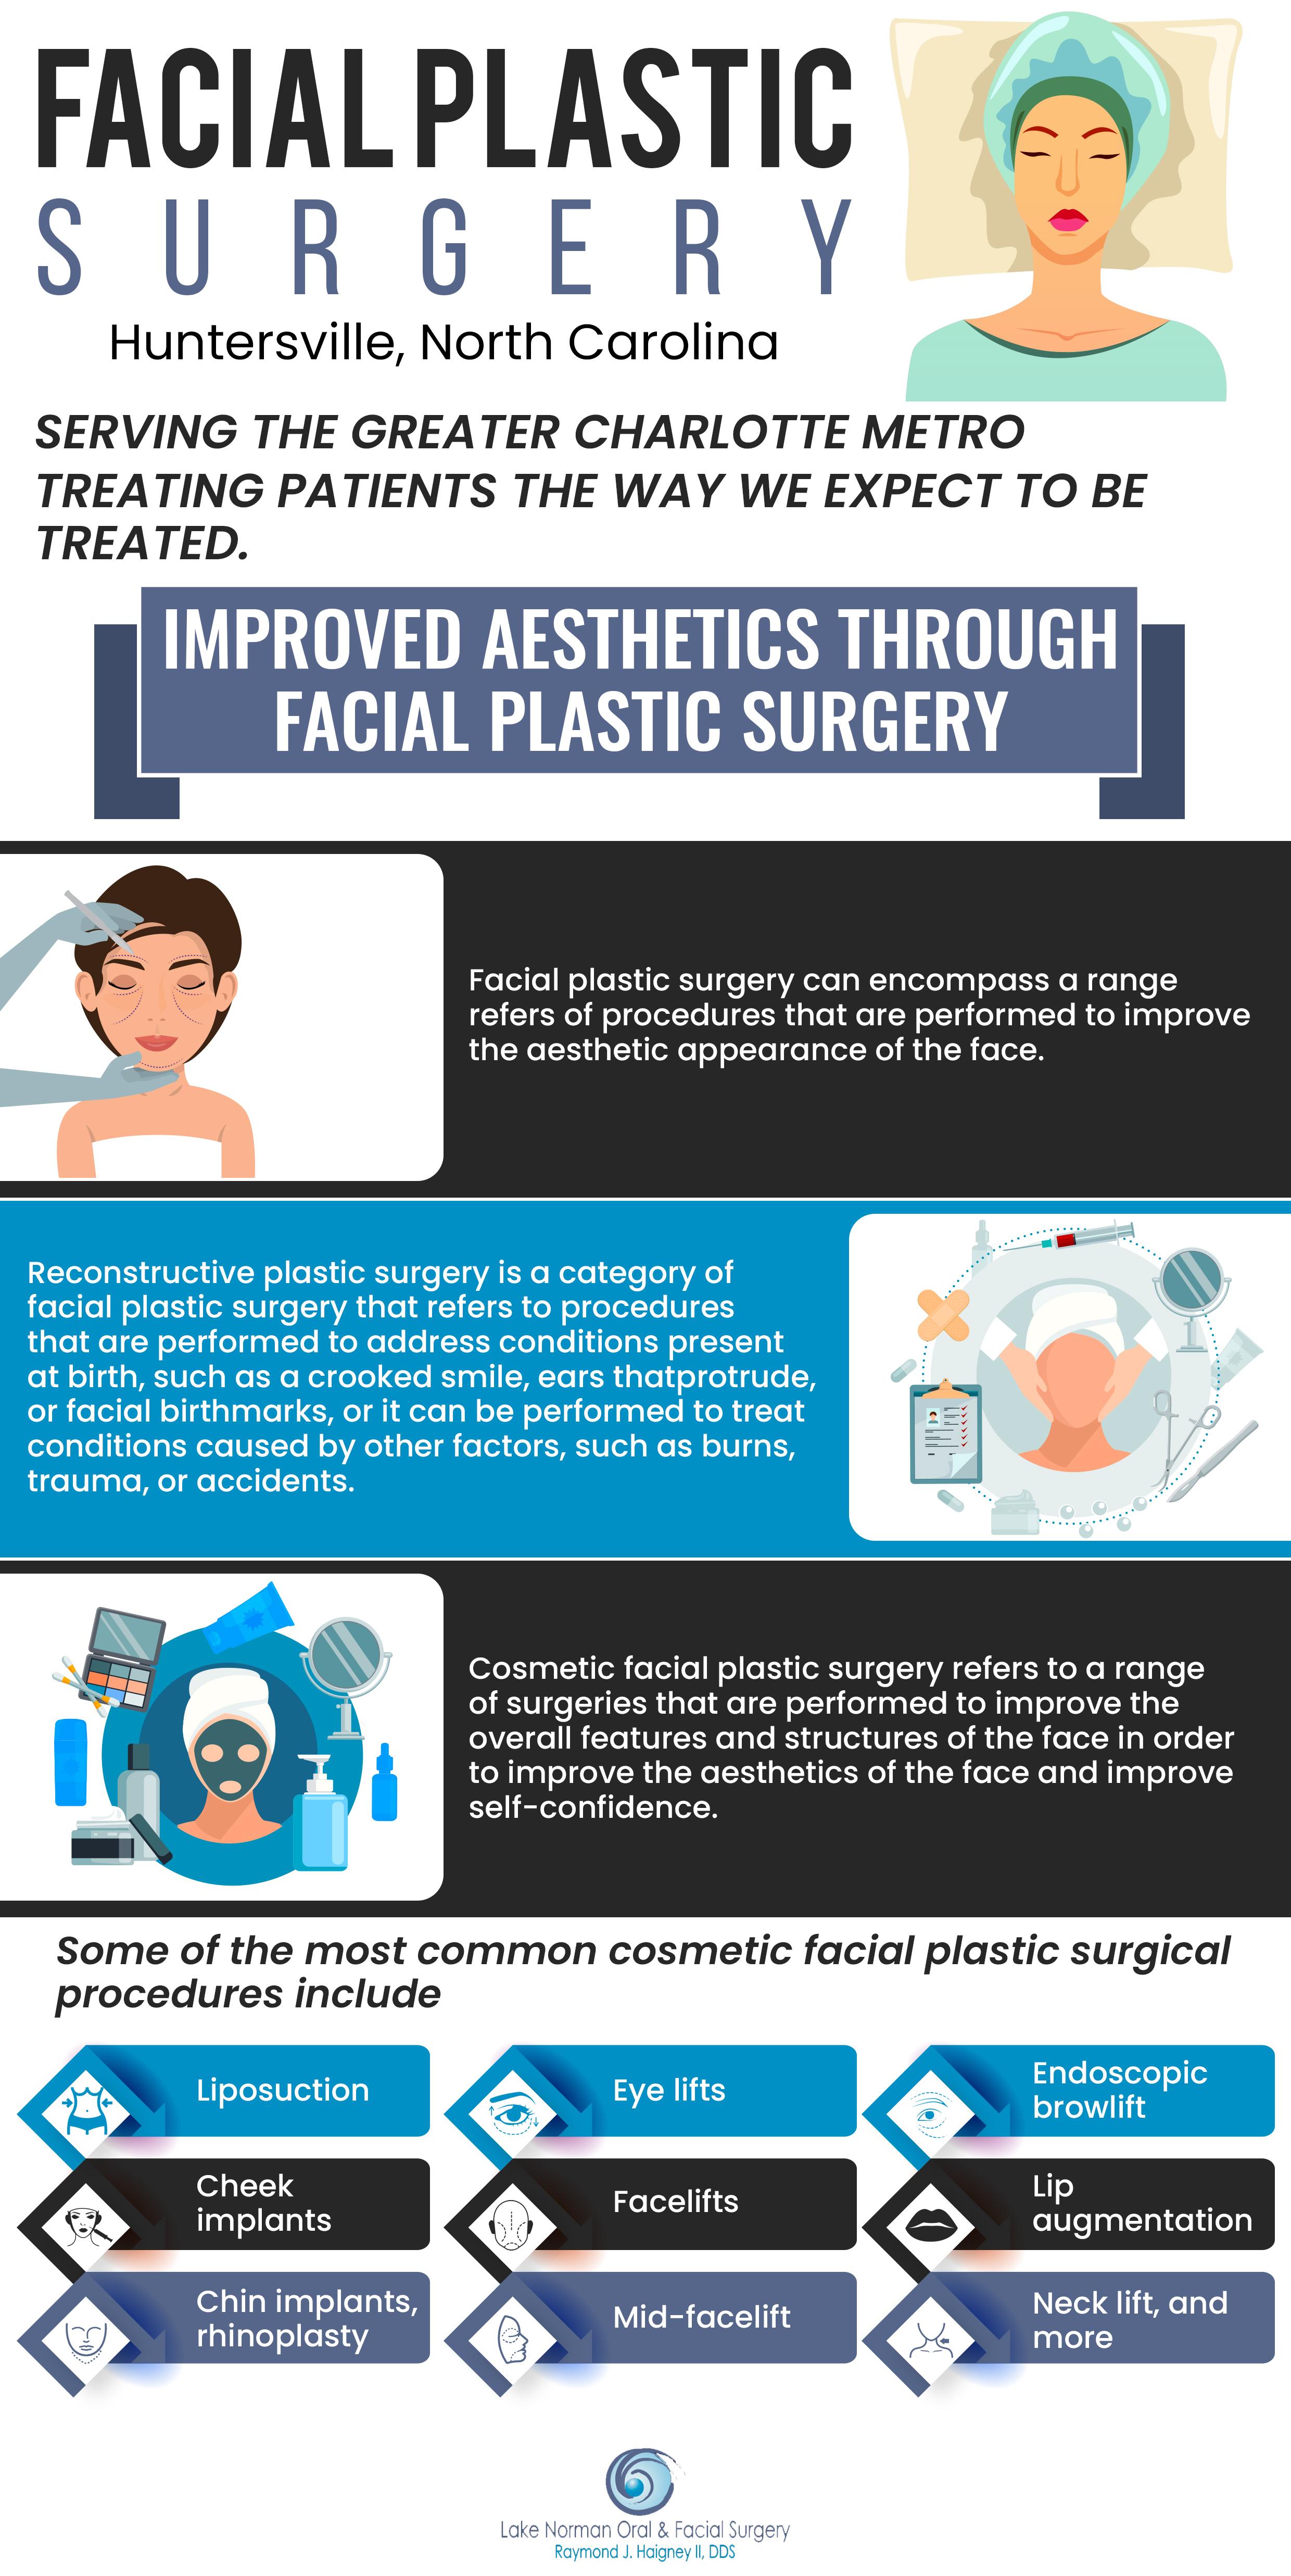 Facial Plastic Surgery Huntersville NC